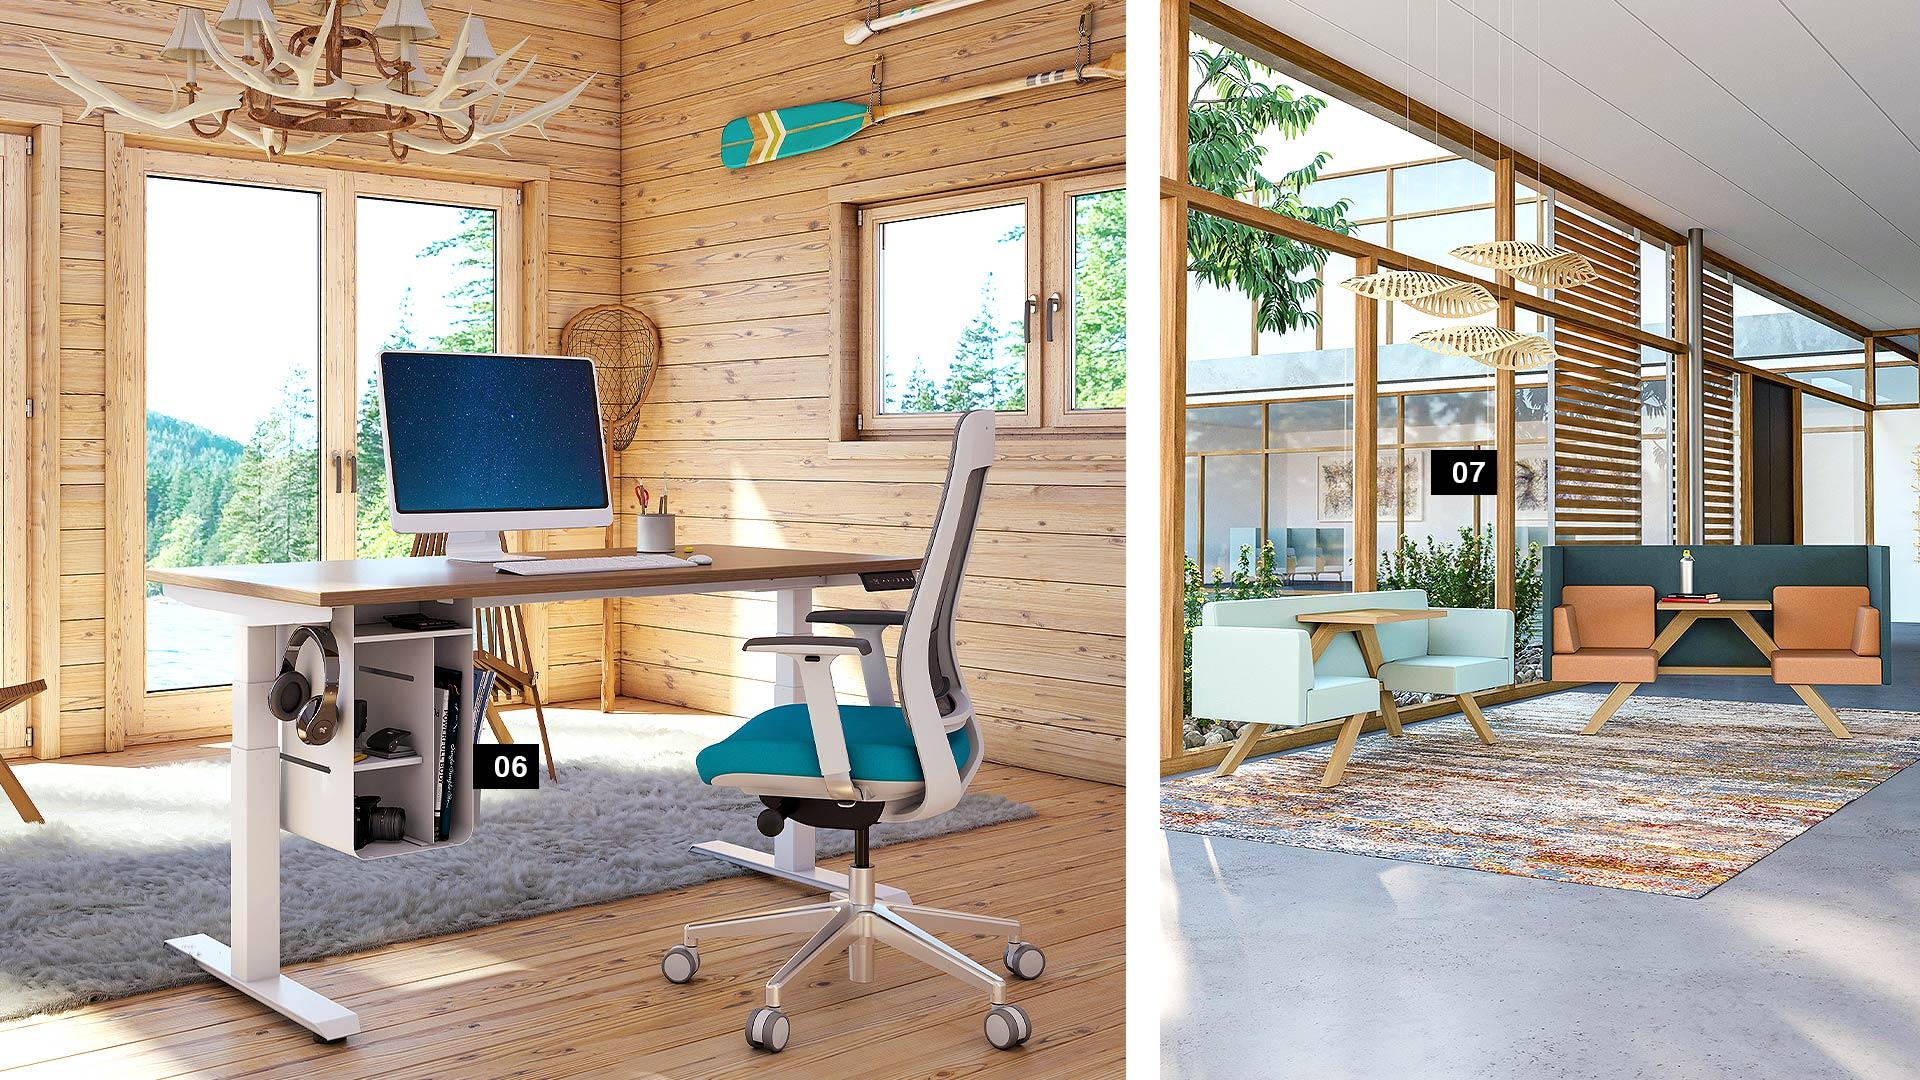 scandinavian-office-amq-revi-pedestal-arcadia-tooapicnic-lounge